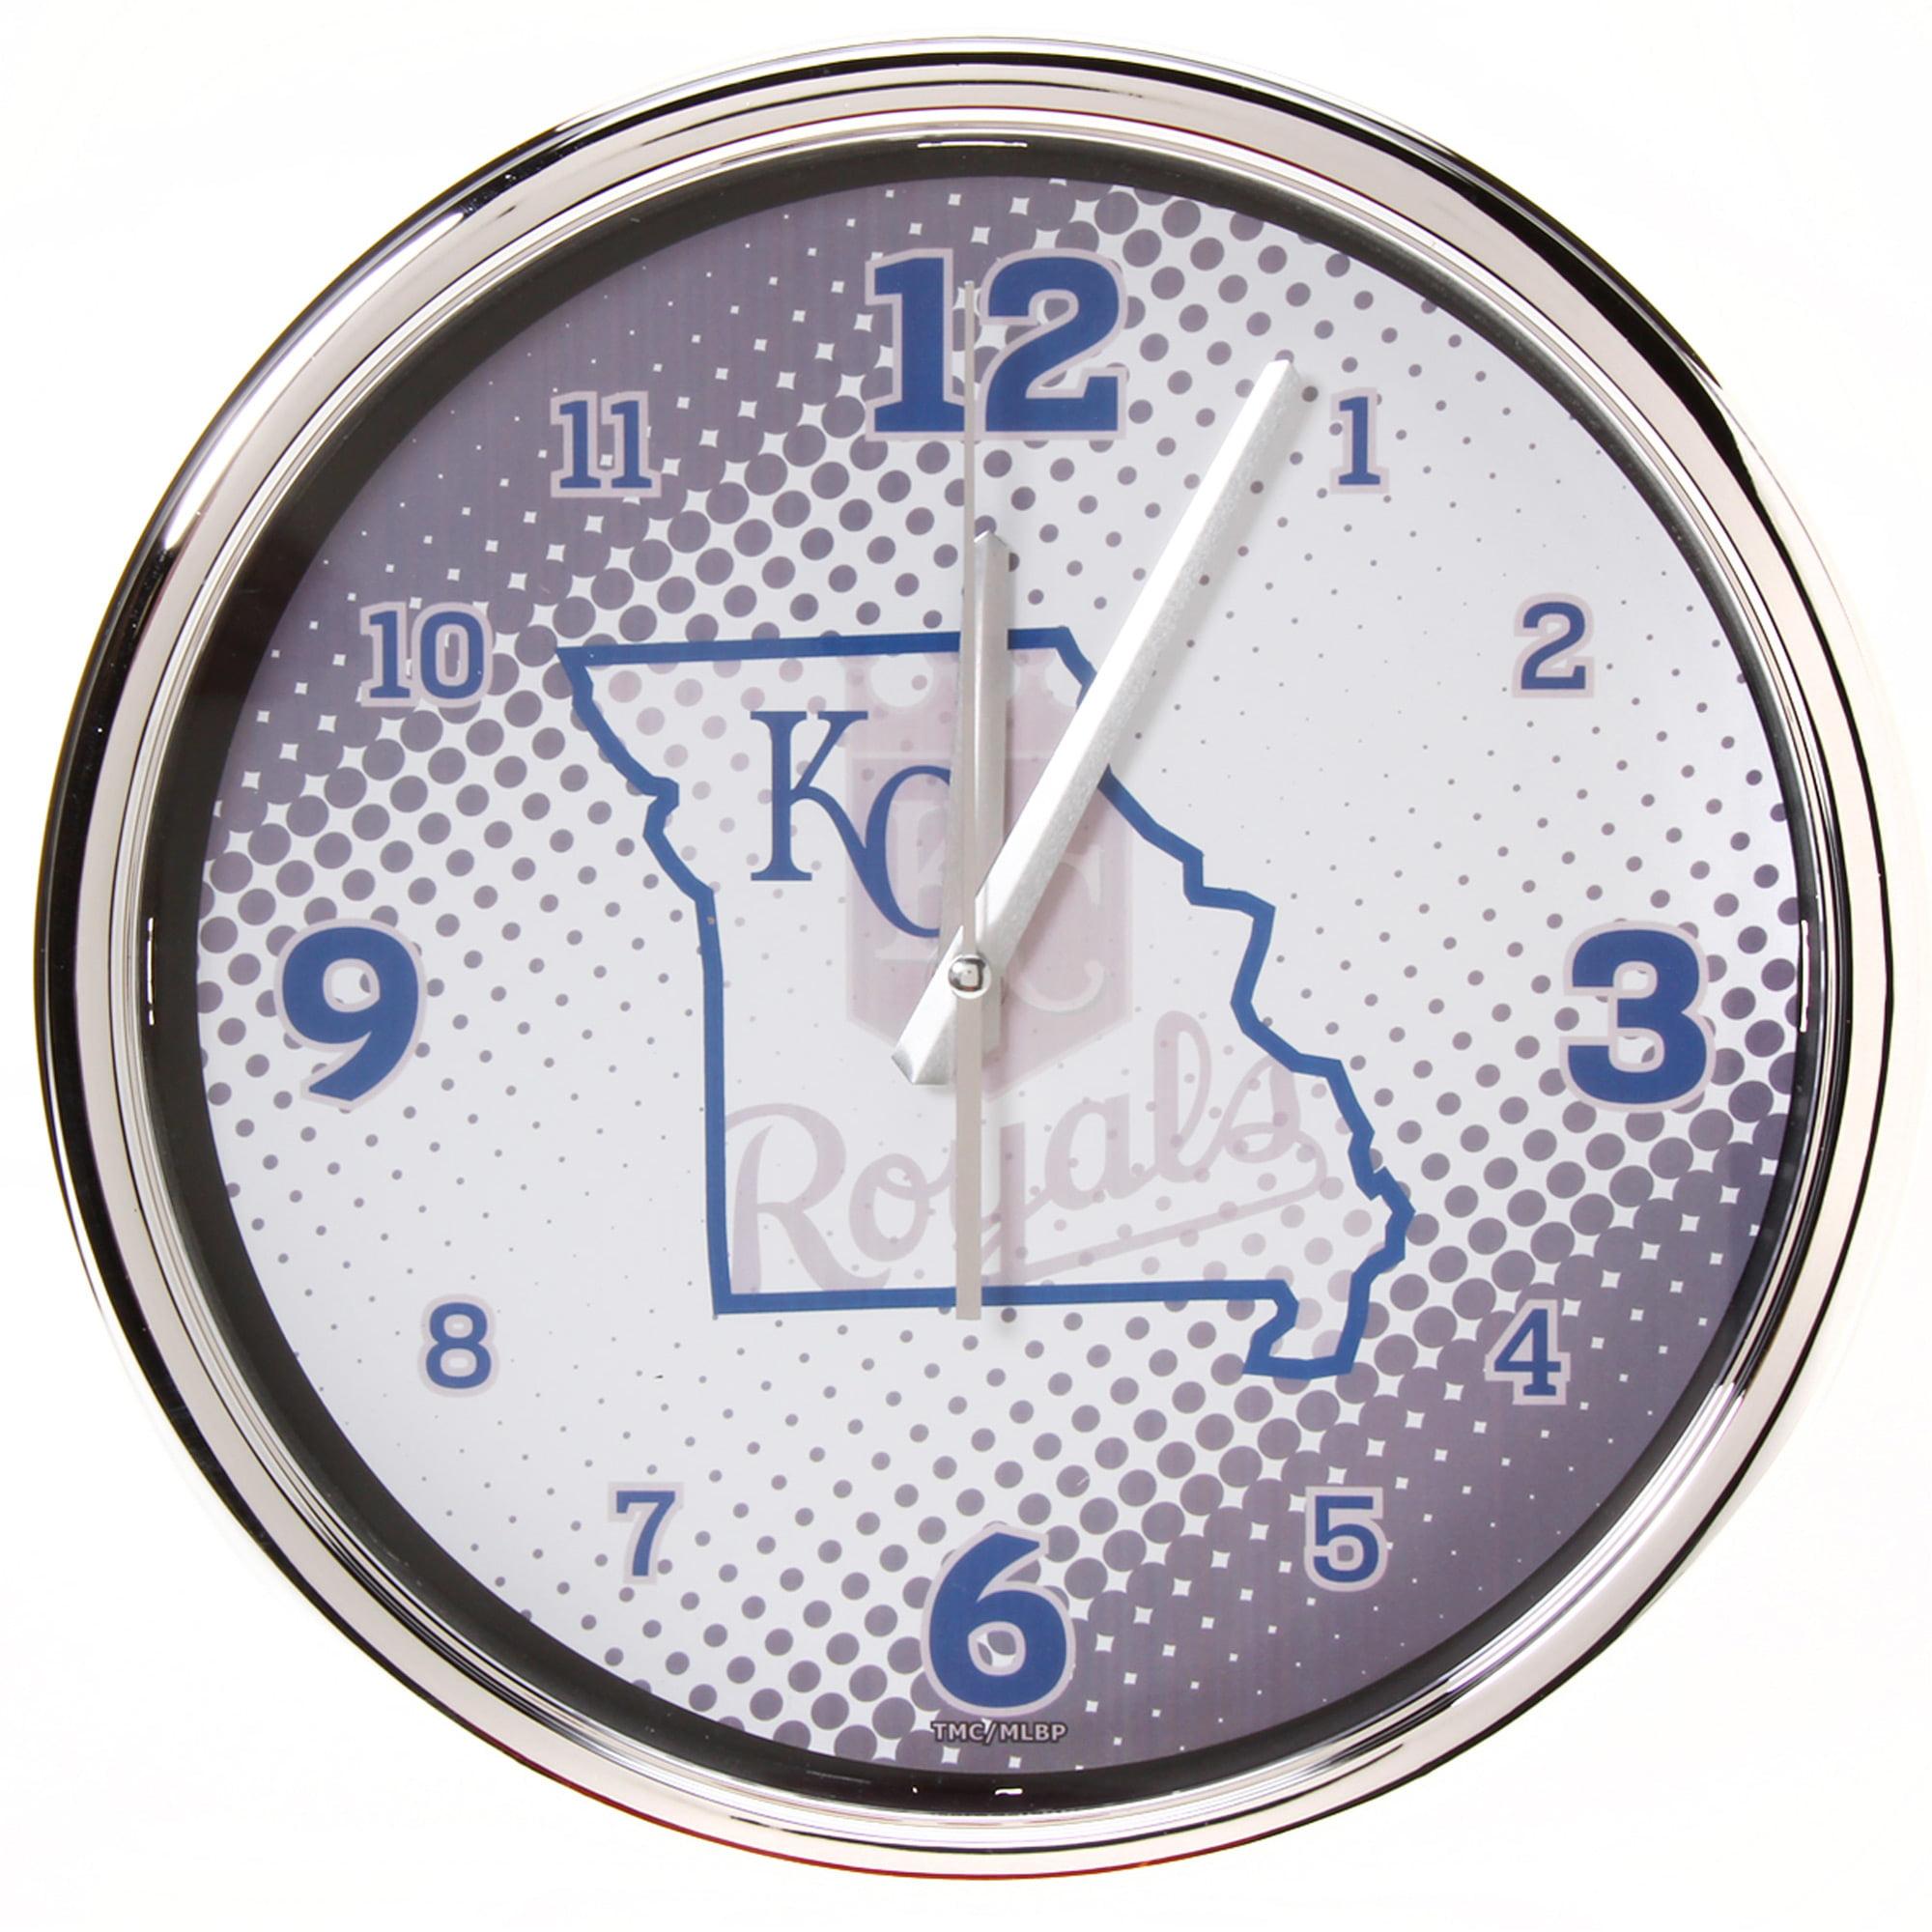 "Kansas City Royals State of Mind 12"" Chrome Wall Clock - No Size"